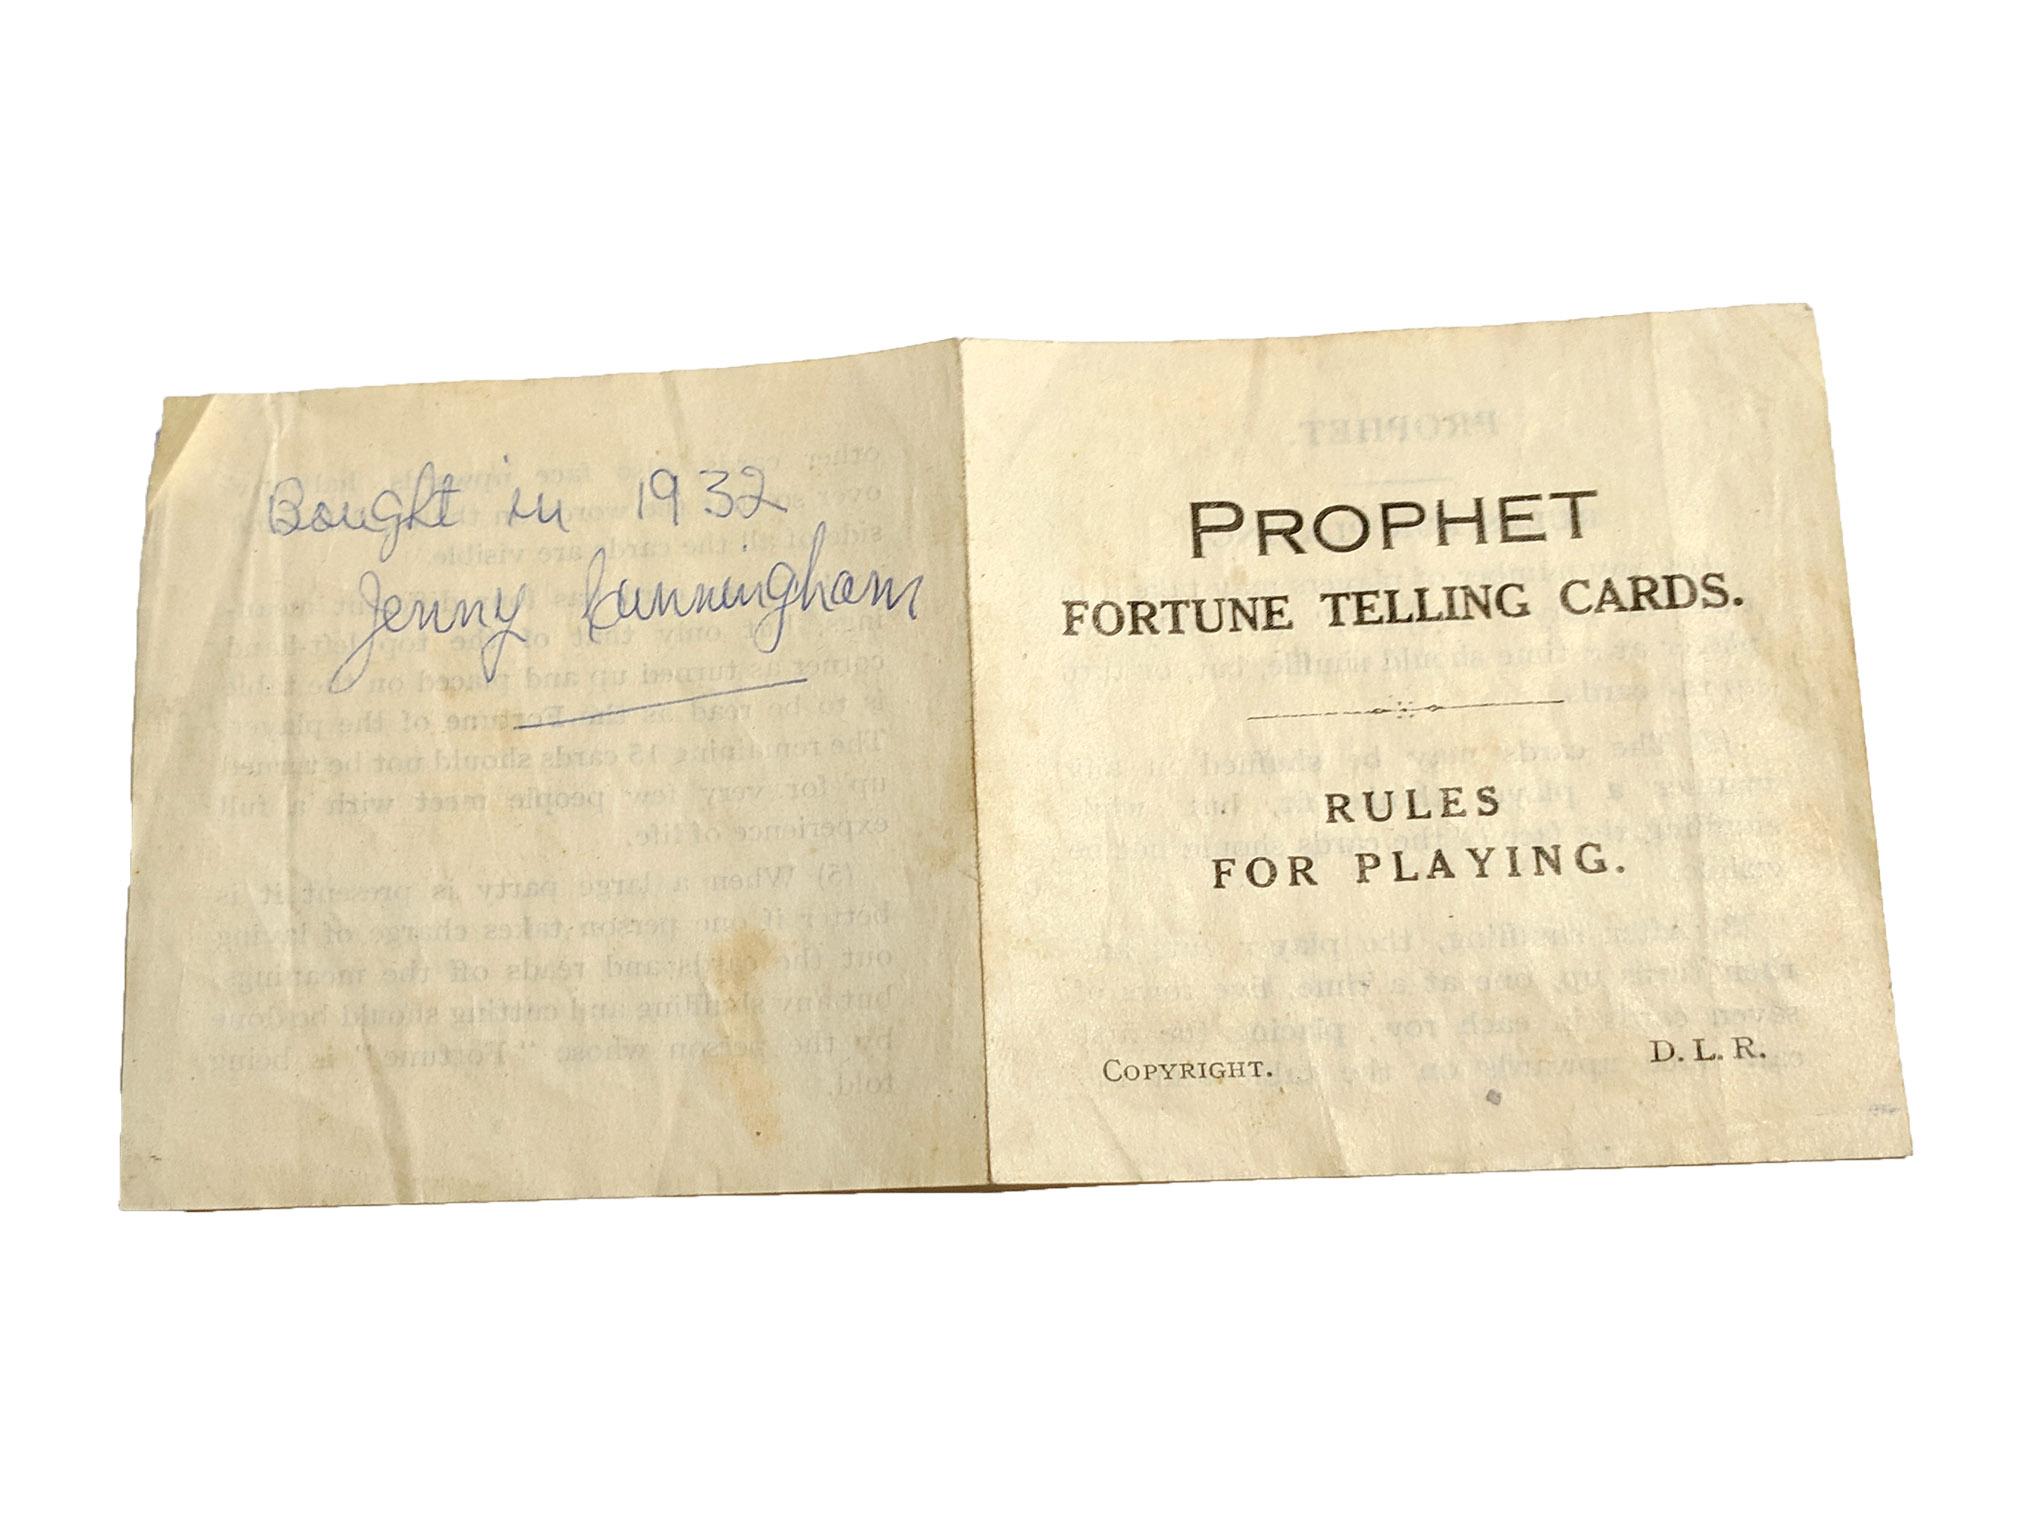 Prophet fortune cards (1).jpg